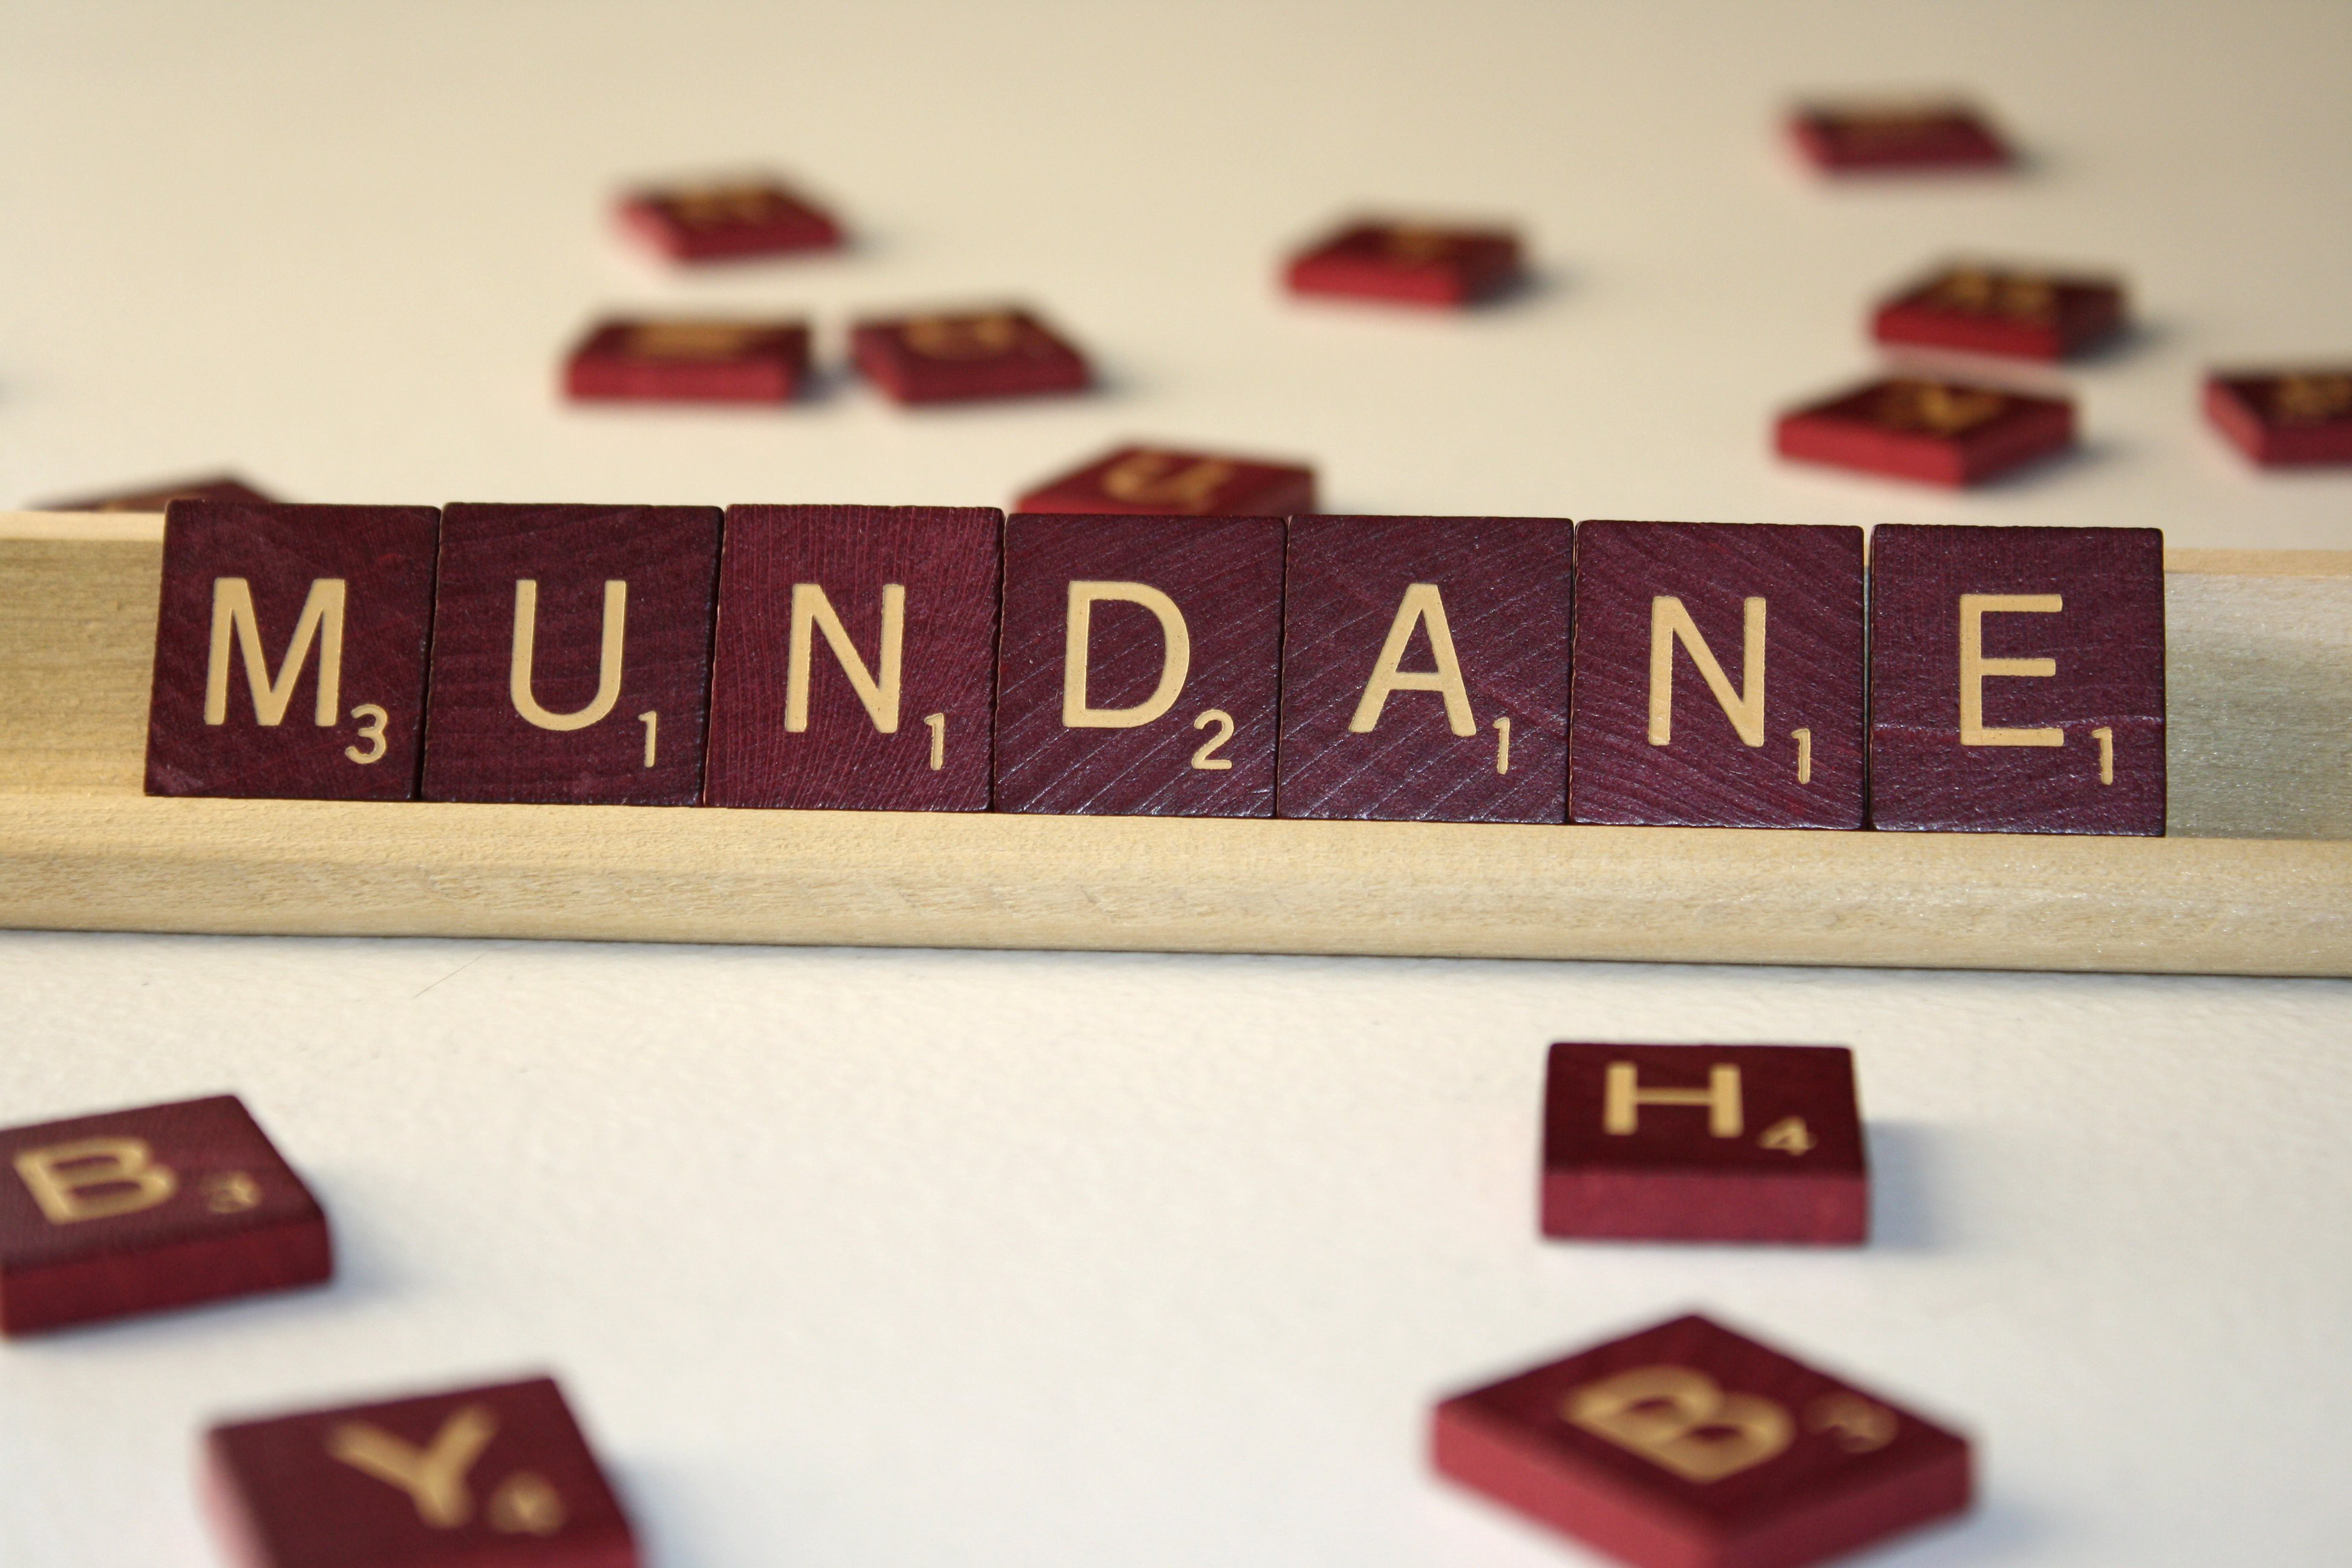 Mundane. Sometimes when I write things like… | by Garrett Holle ...